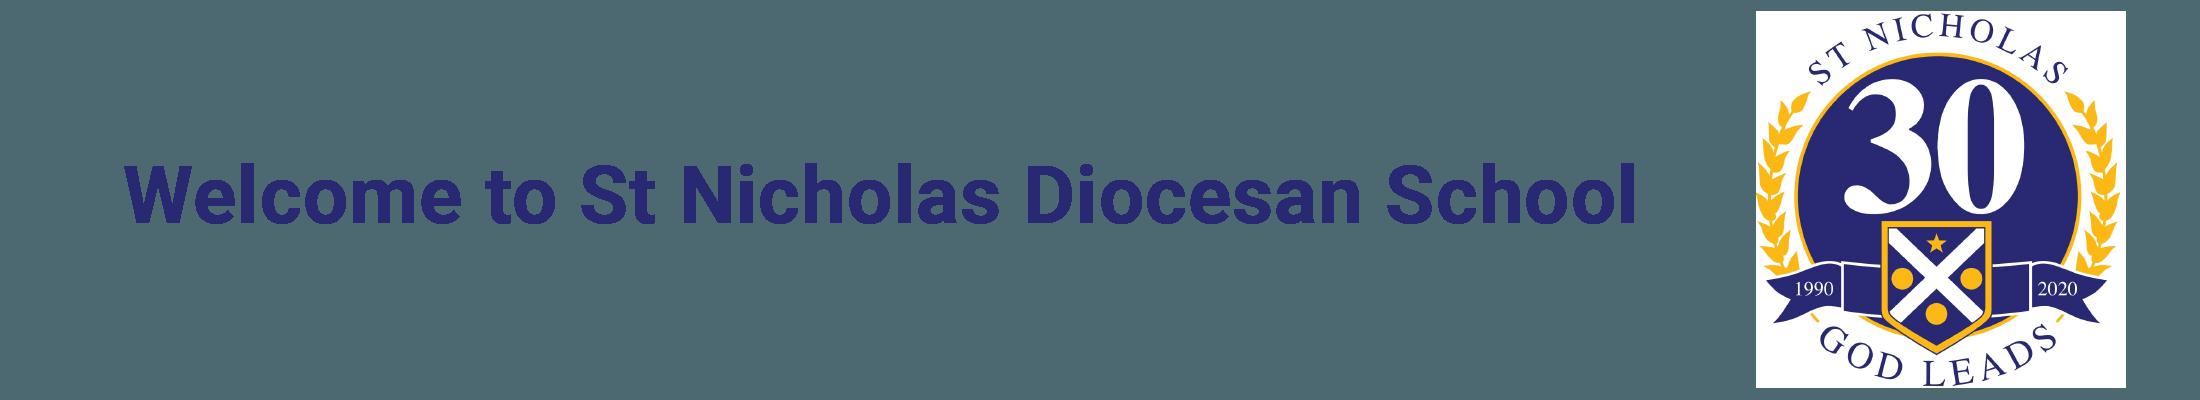 St Nicholas Diocesan